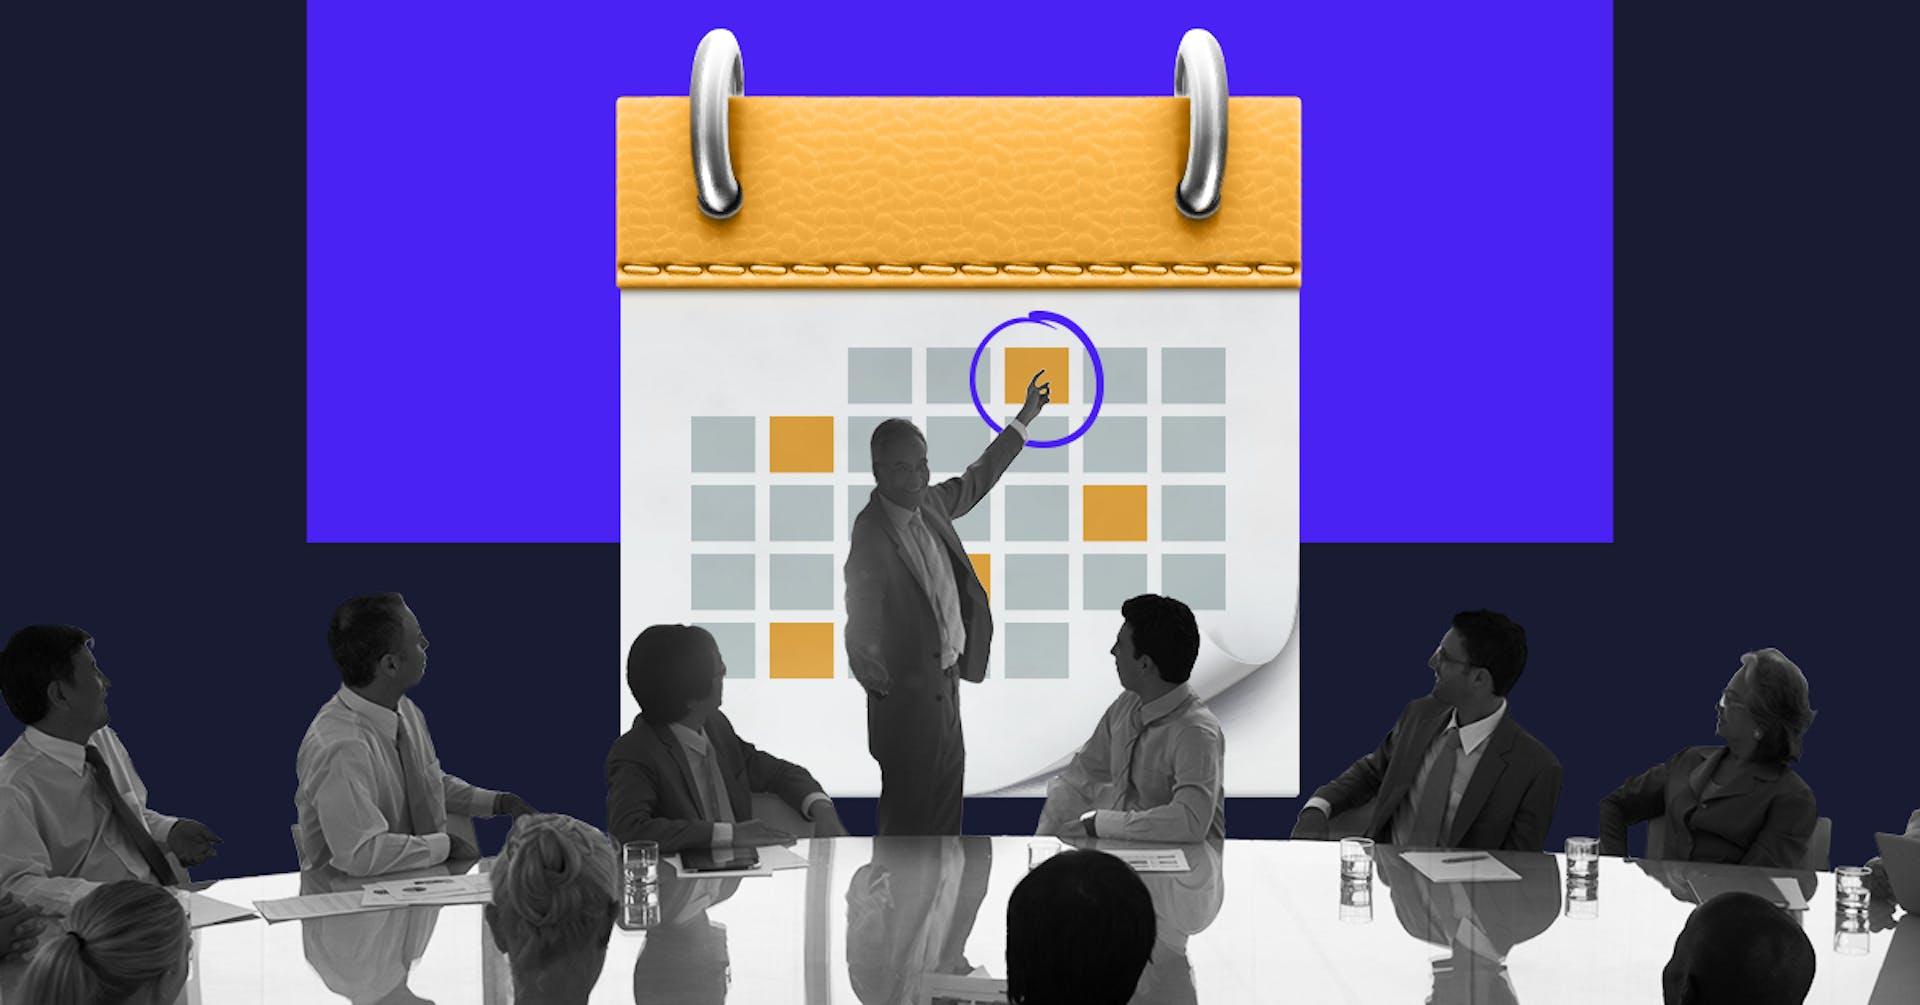 4 consejos para ser un líder organizado